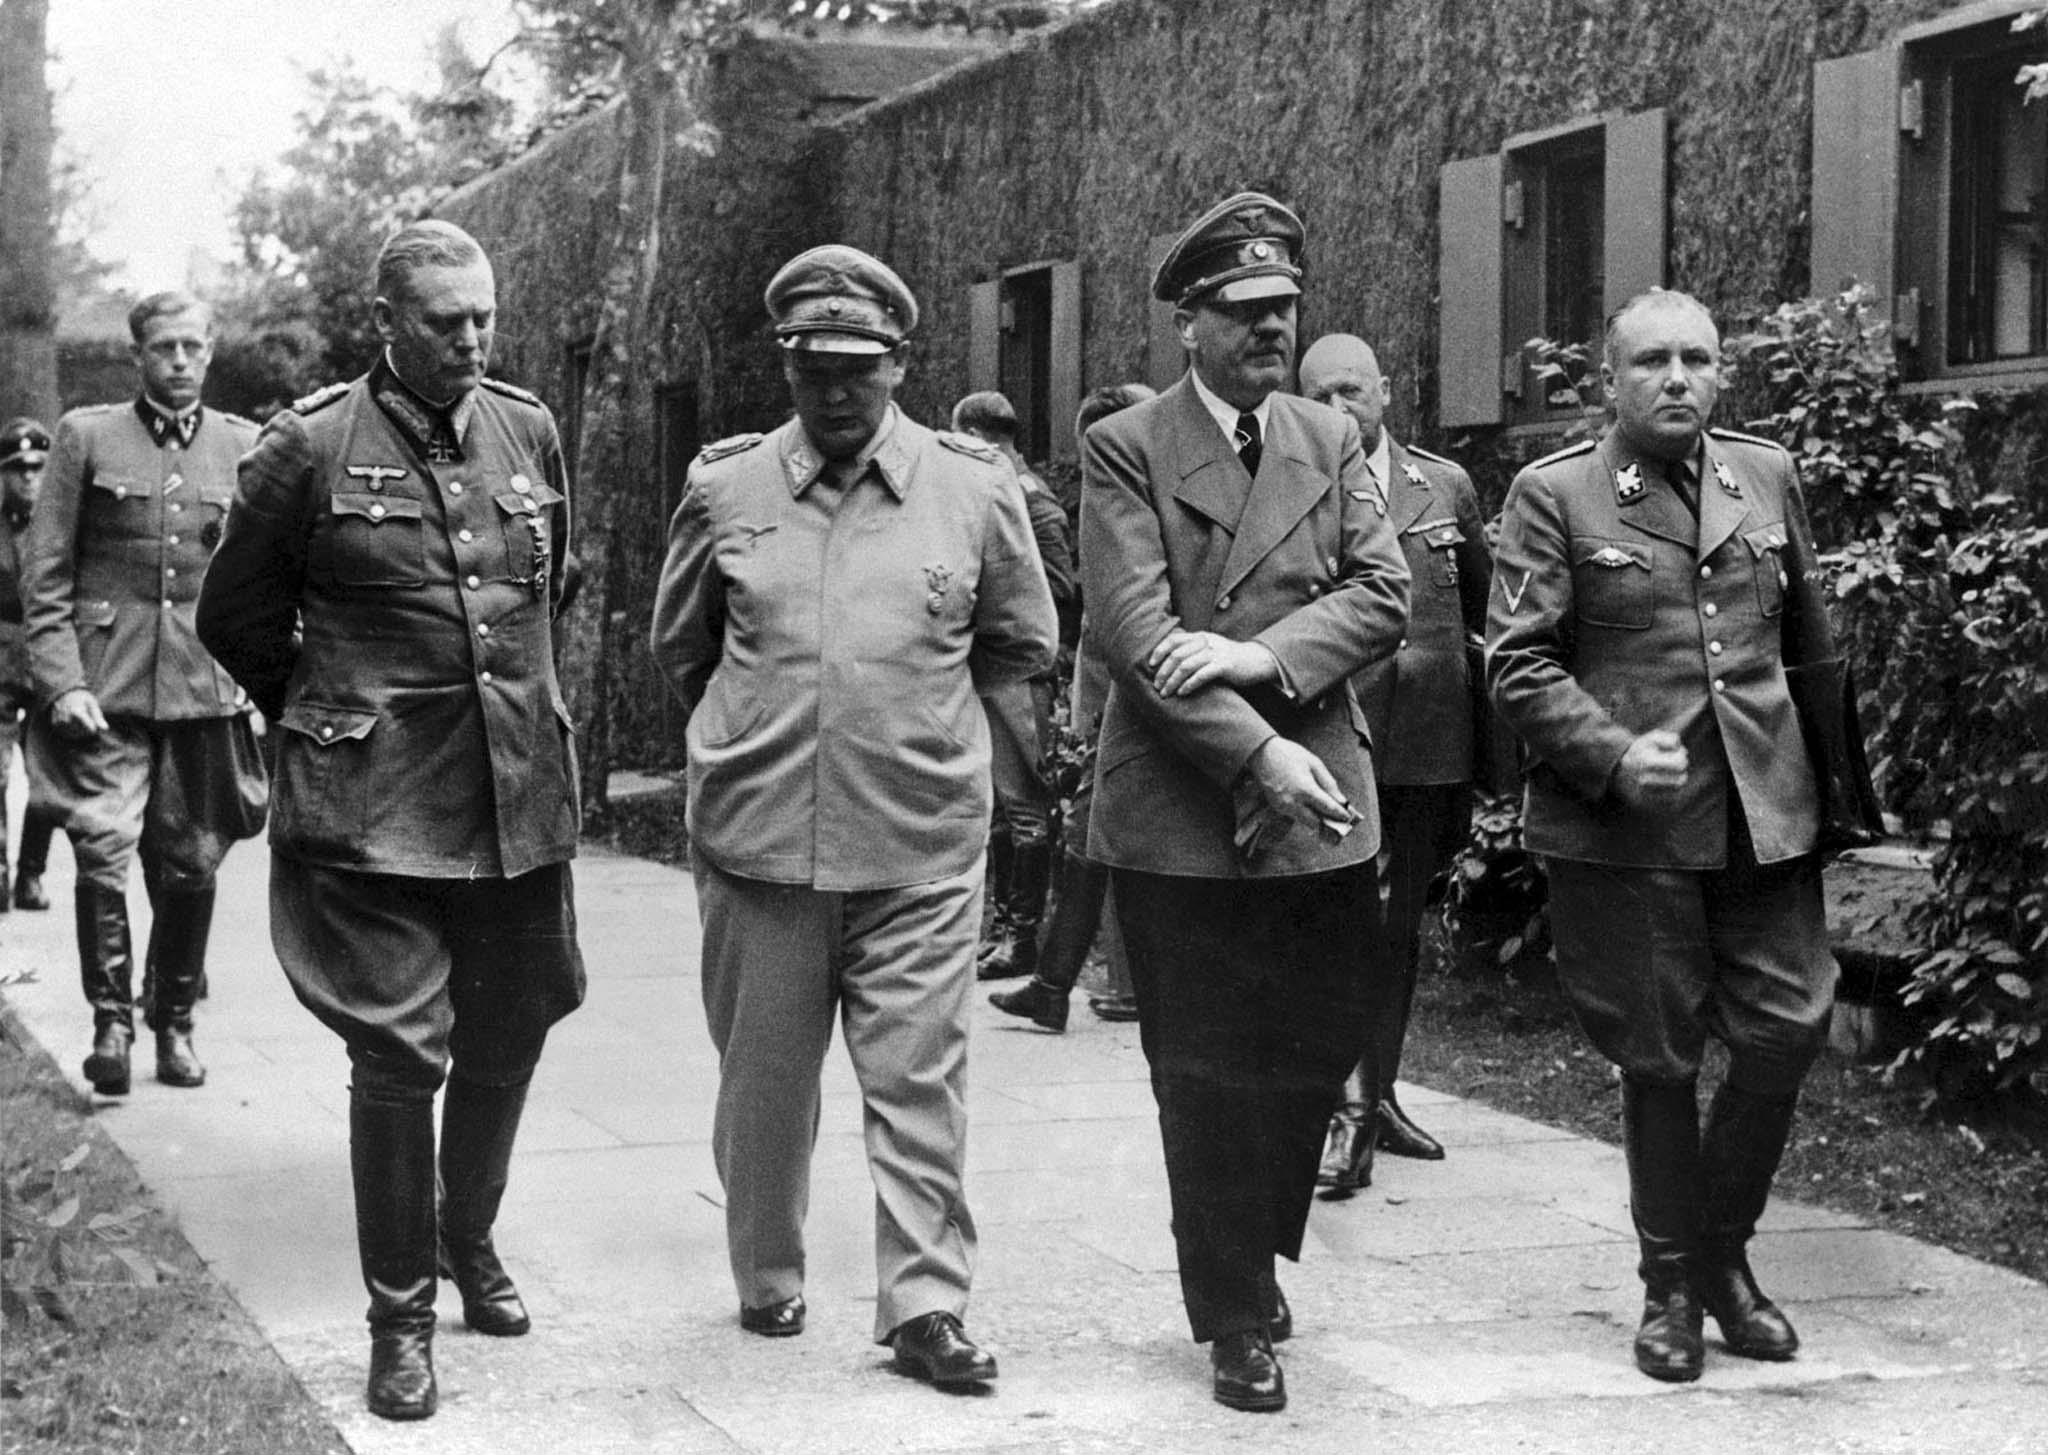 Adolf Hitler, Wilhelm Keitel, Hermann Goering,  Martin Borman